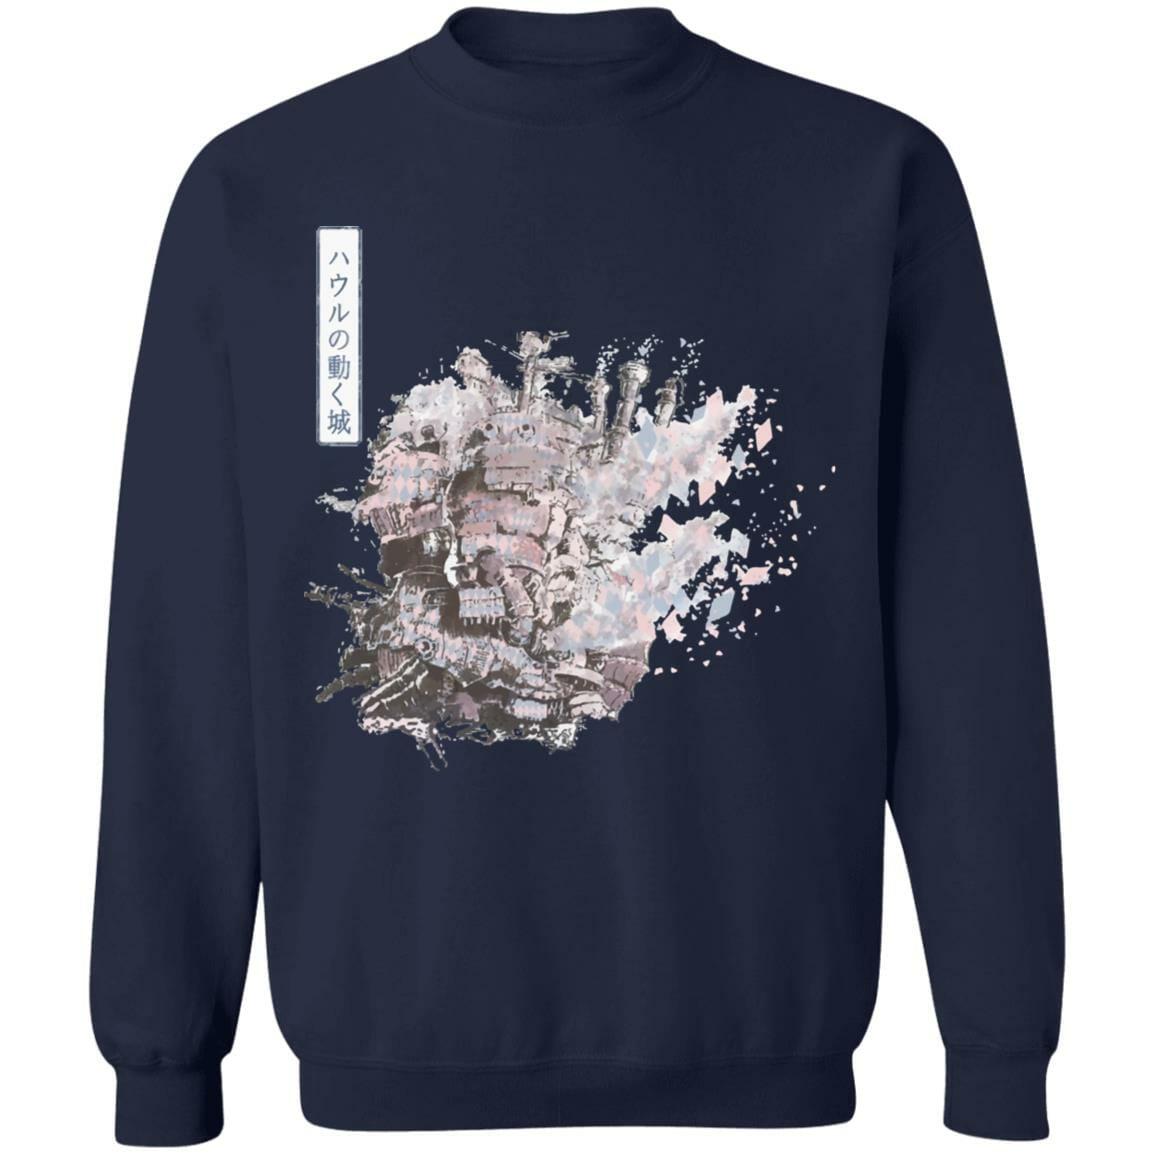 Howl's Moving Castle Classic Sweatshirt